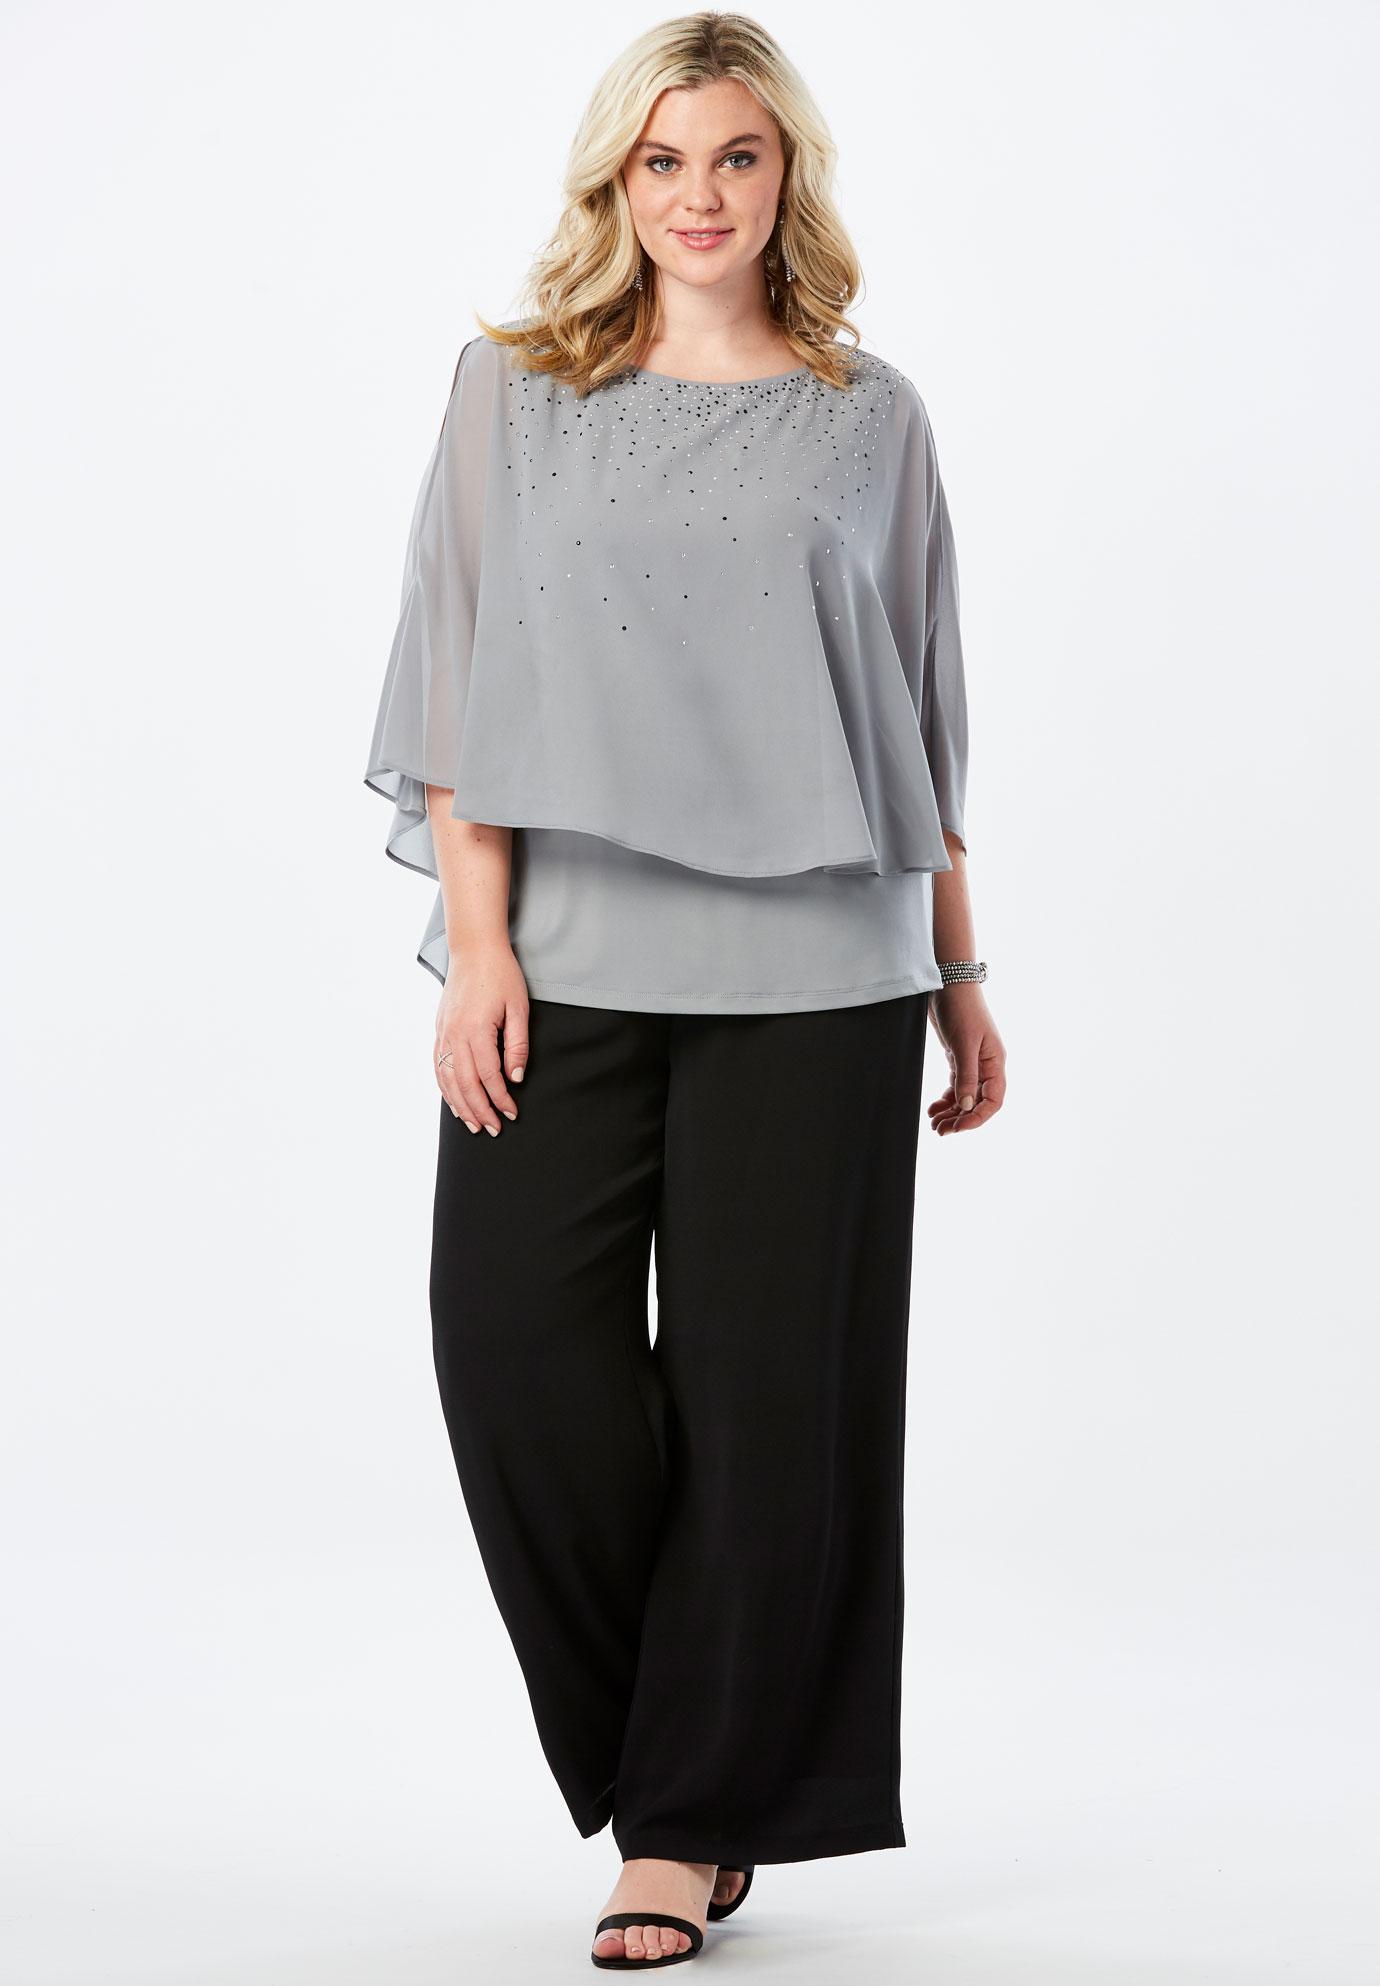 a3536fc76 Studded Pant Set| Plus Size Suits & Sets | Full Beauty